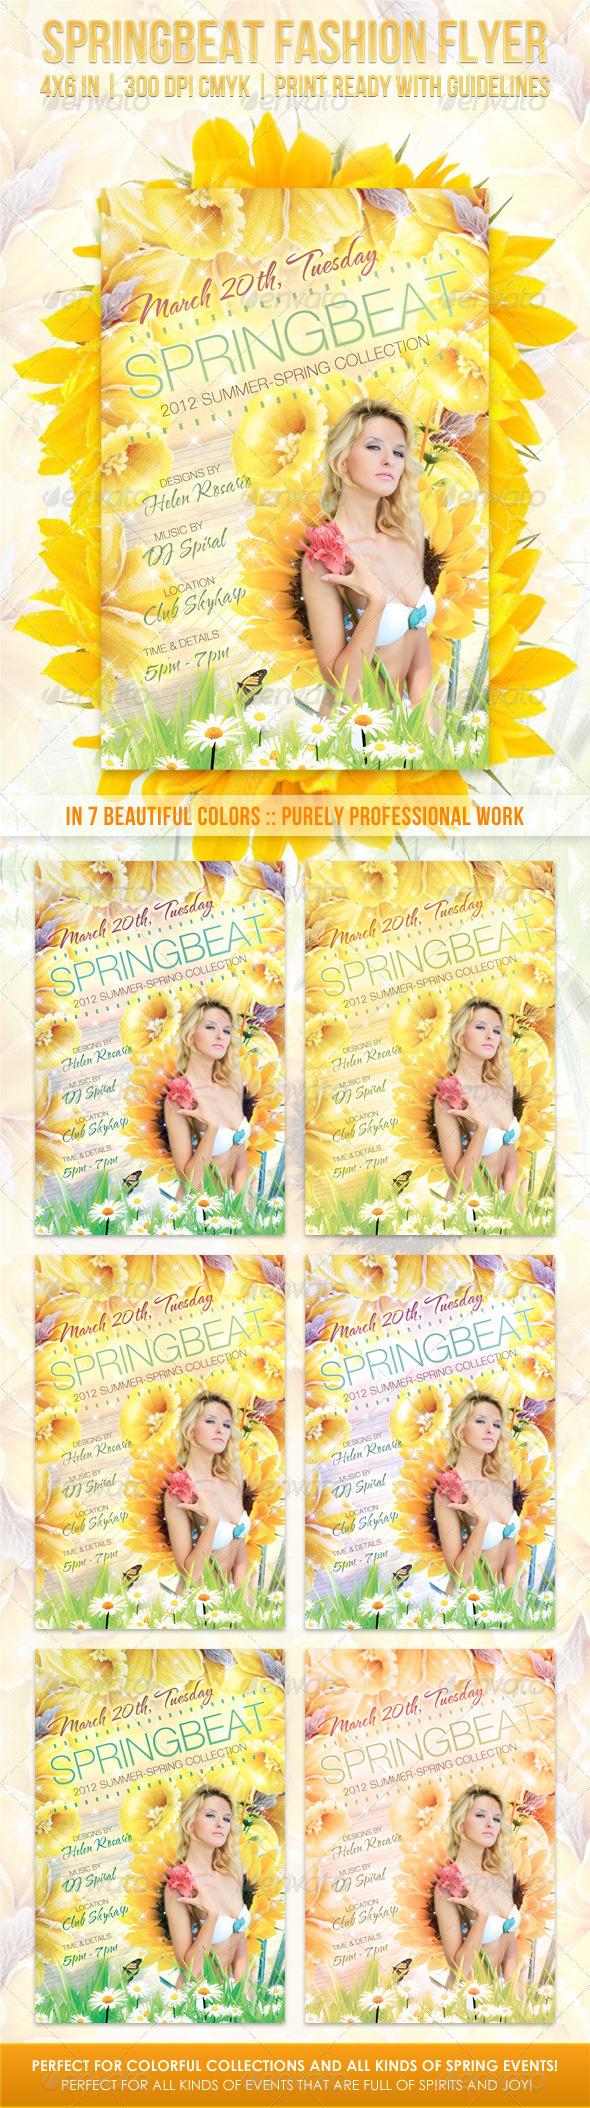 Springbeat Spring Fashion Flyer - Flyers Print Templates